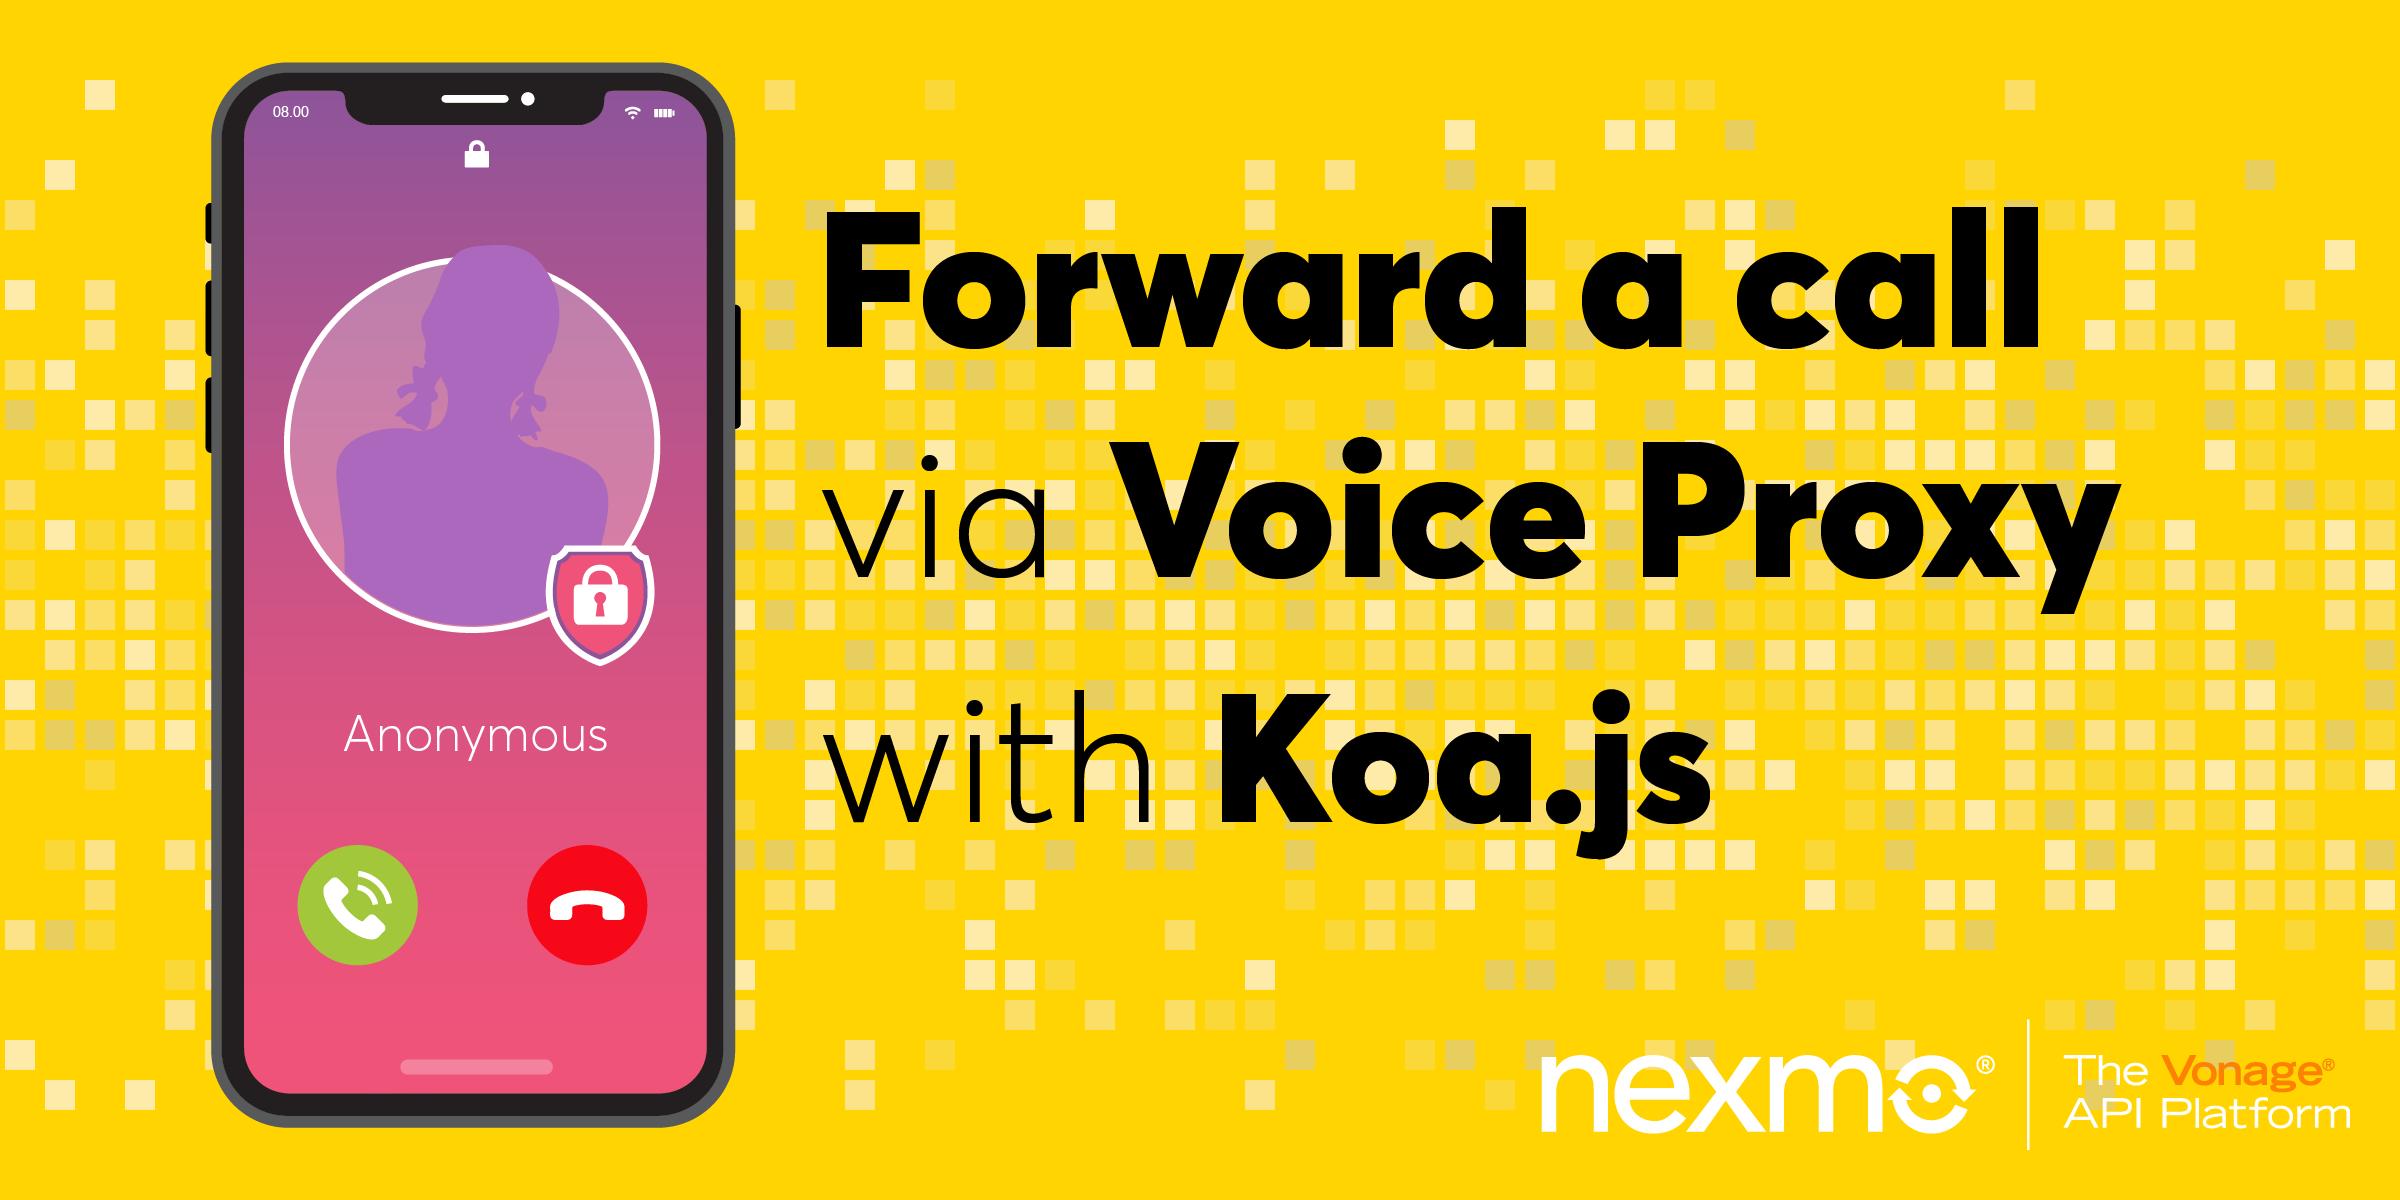 Forward a Call Via Voice Proxy With Koa.js